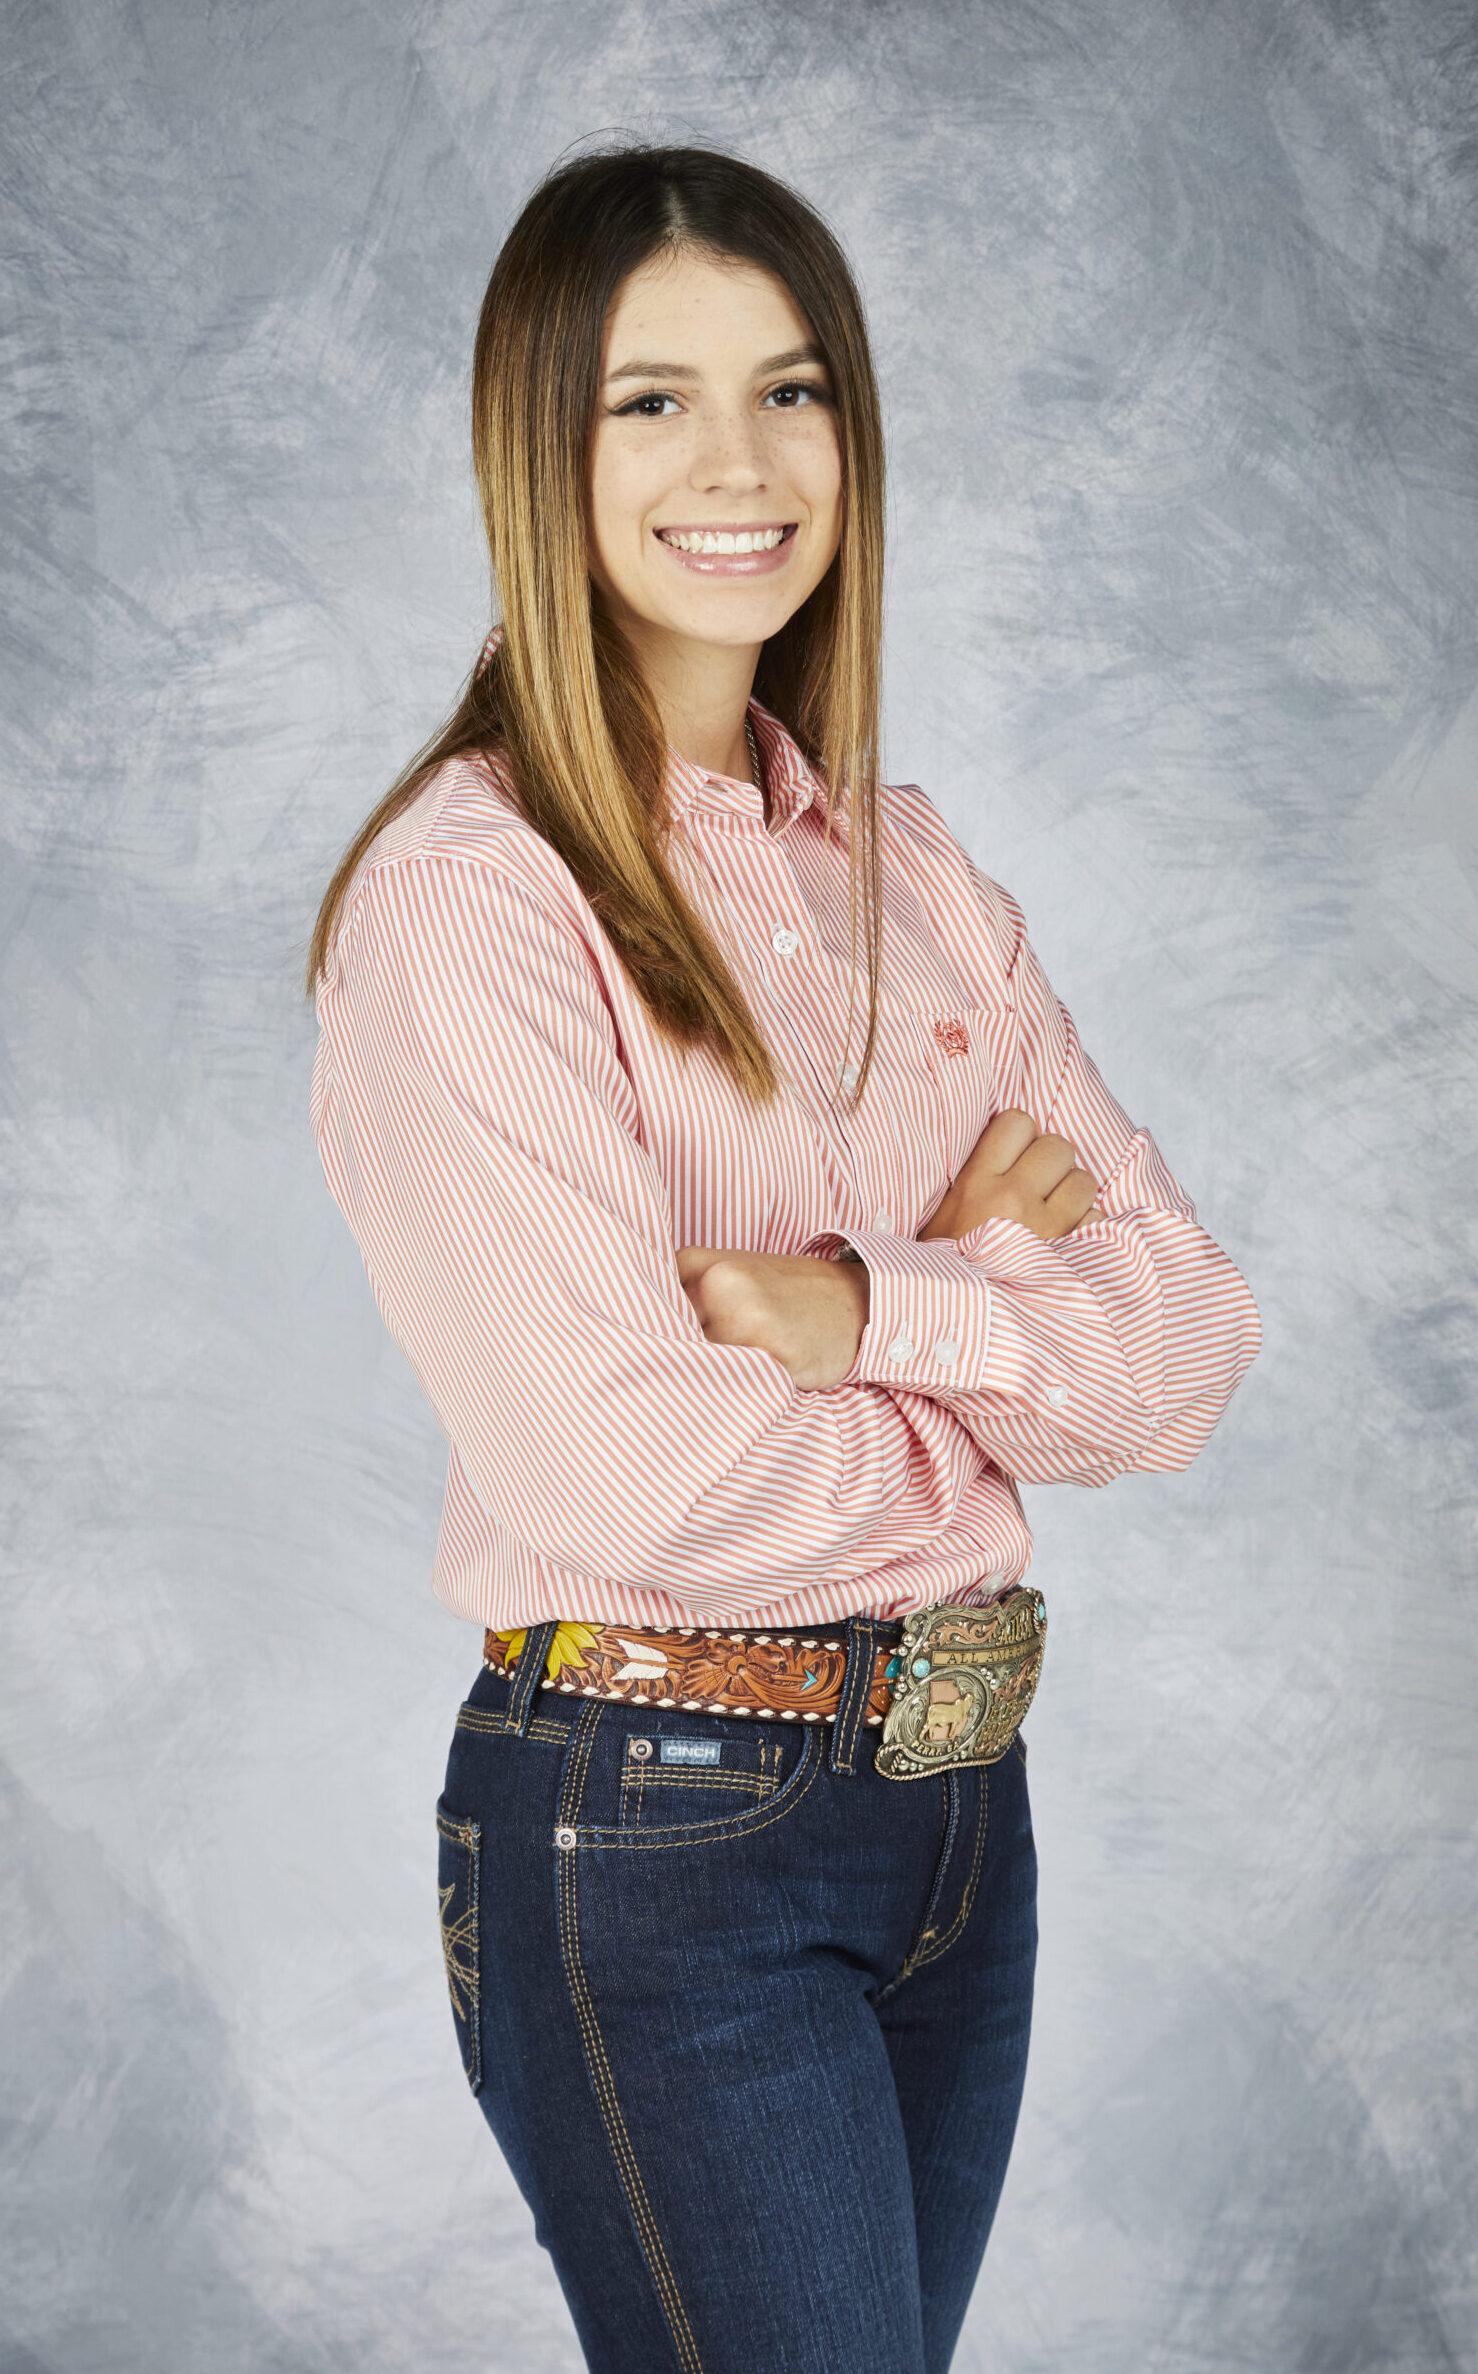 Aubrey Ellis